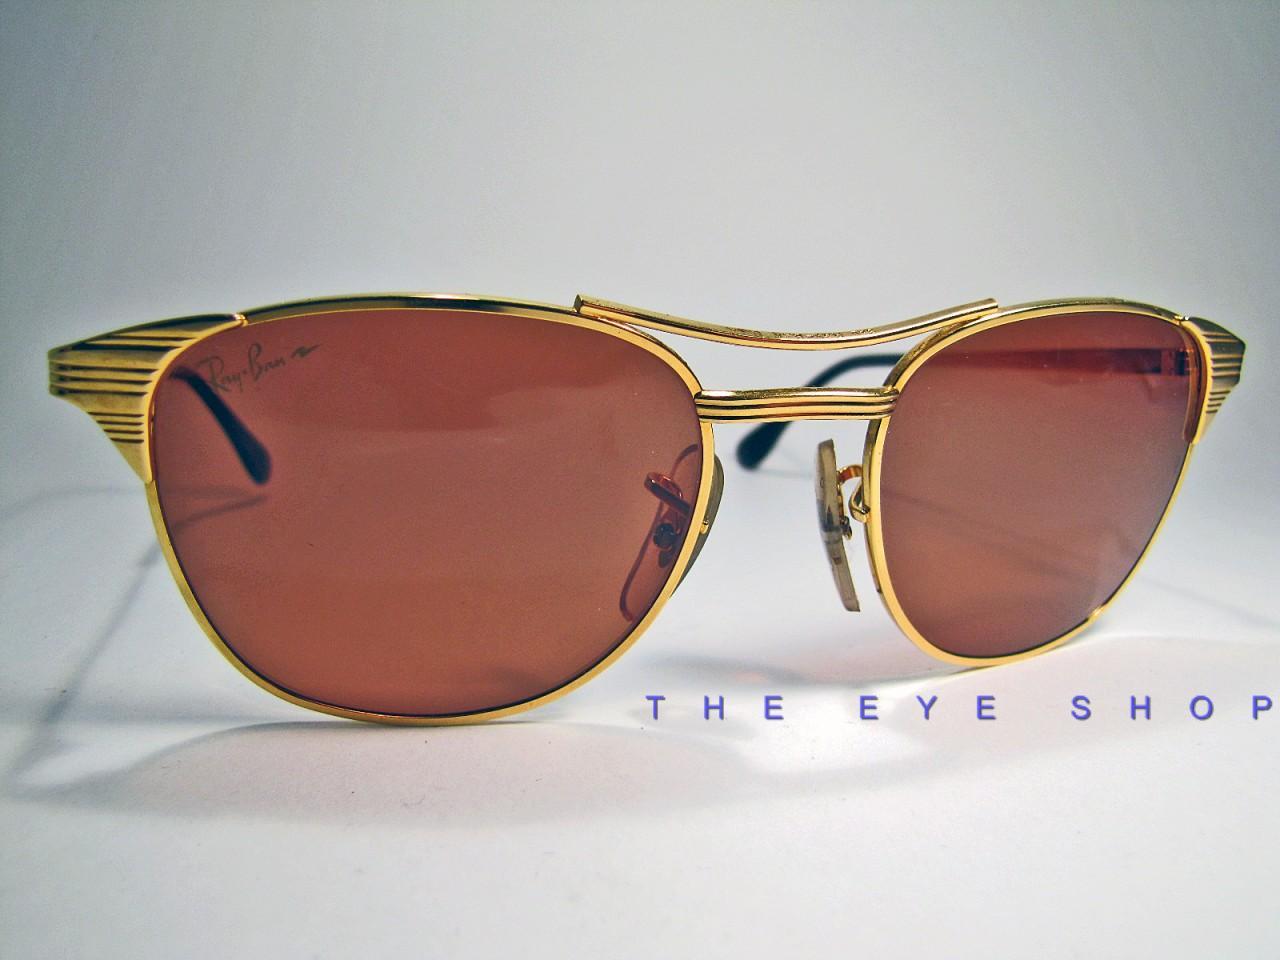 ad5b8a53b0 Vintage B L Ray Ban Signet Wayfarer Sunglasses Chromax